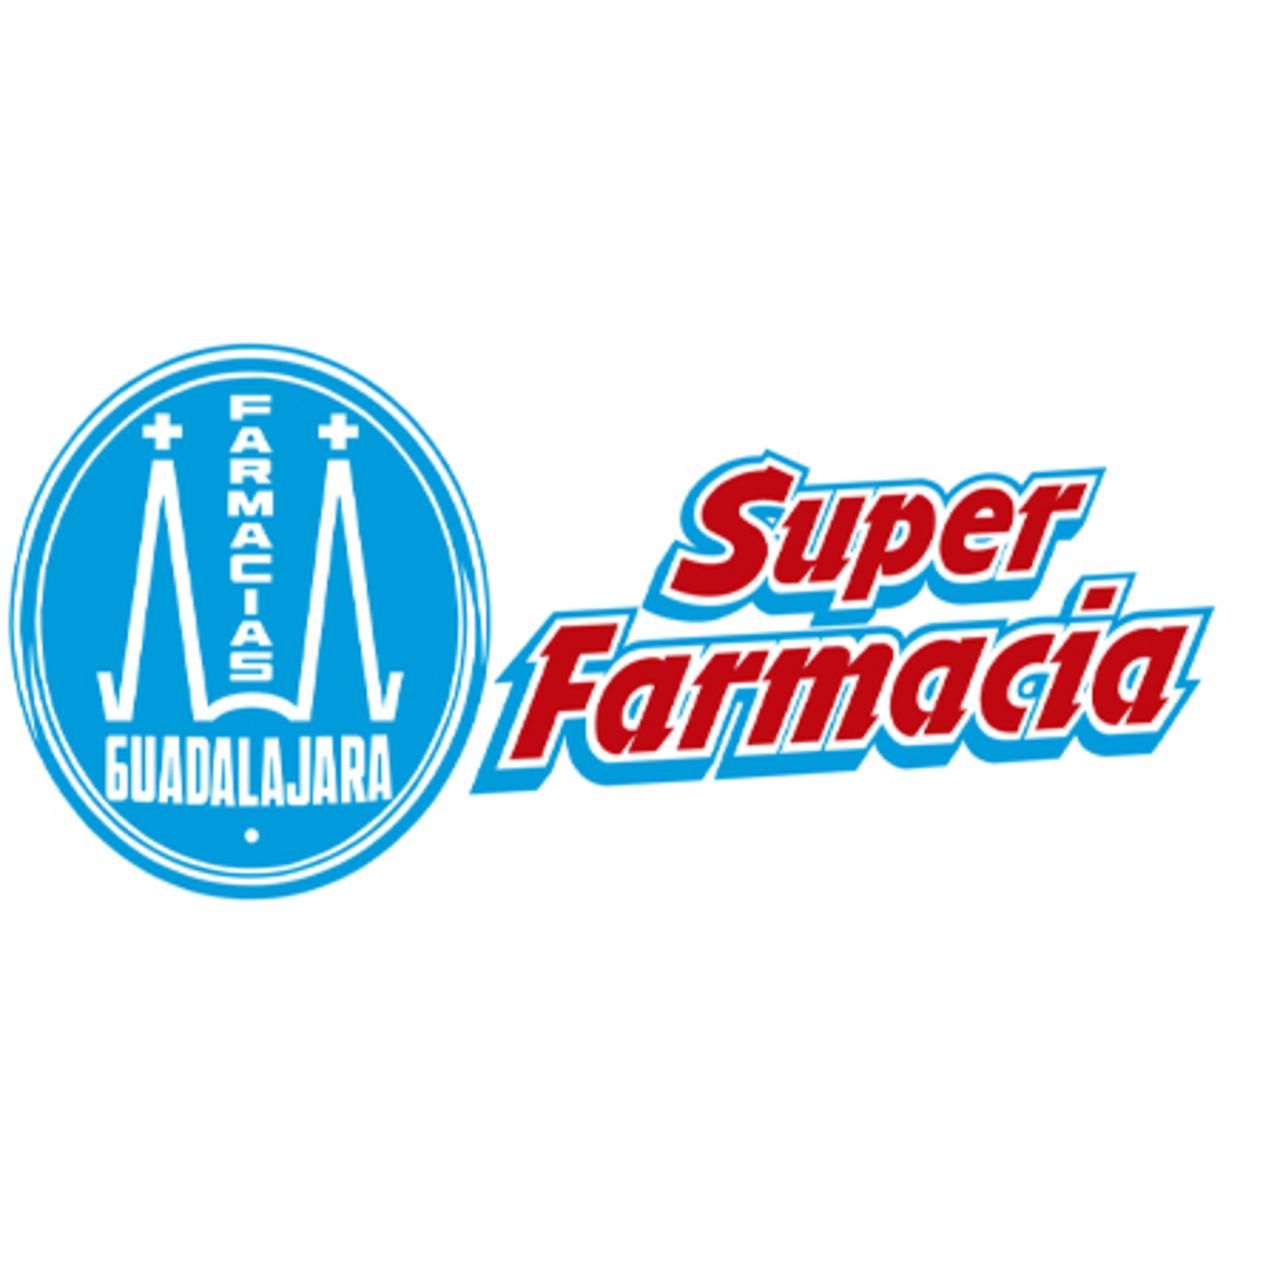 Super Farmacia